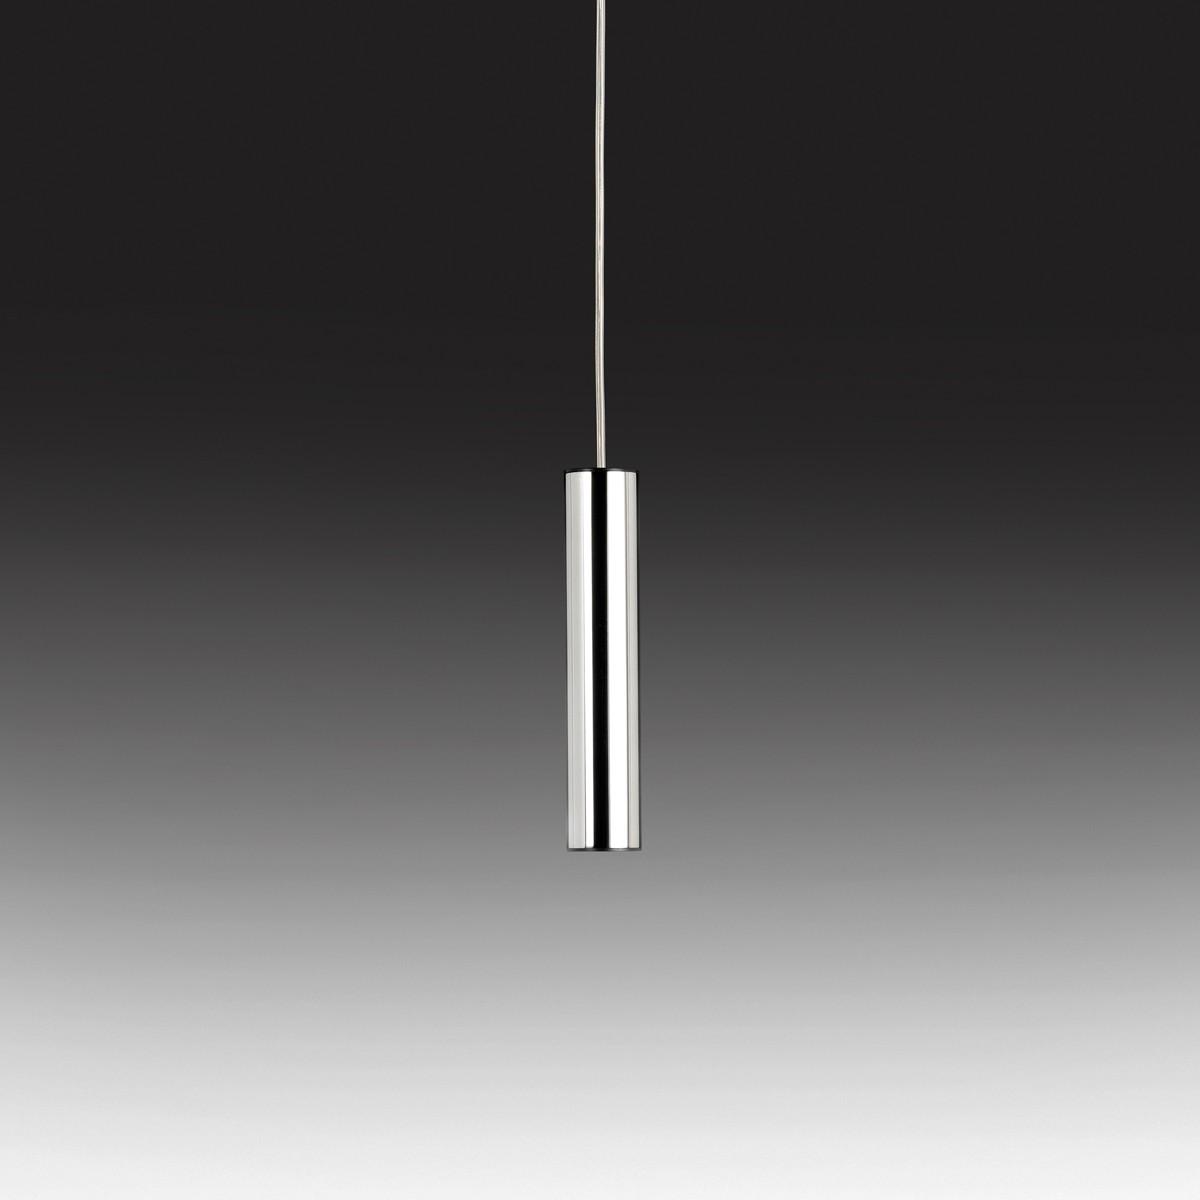 Milan Tub LED Pendelleuchte, Edelstahl poliert / schwarz